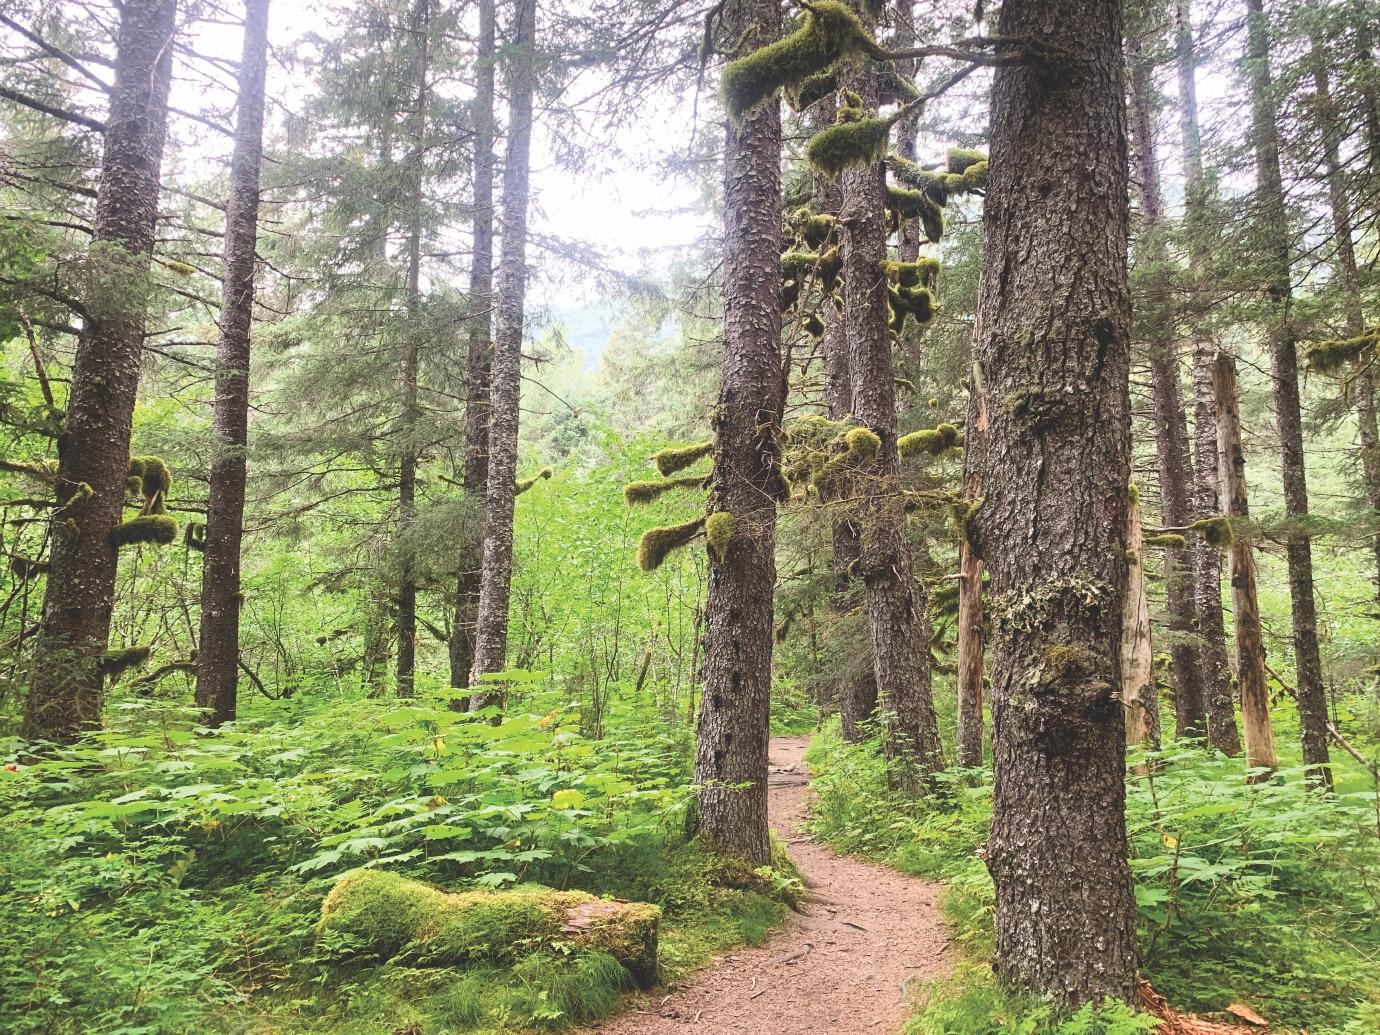 Caines Head Hike